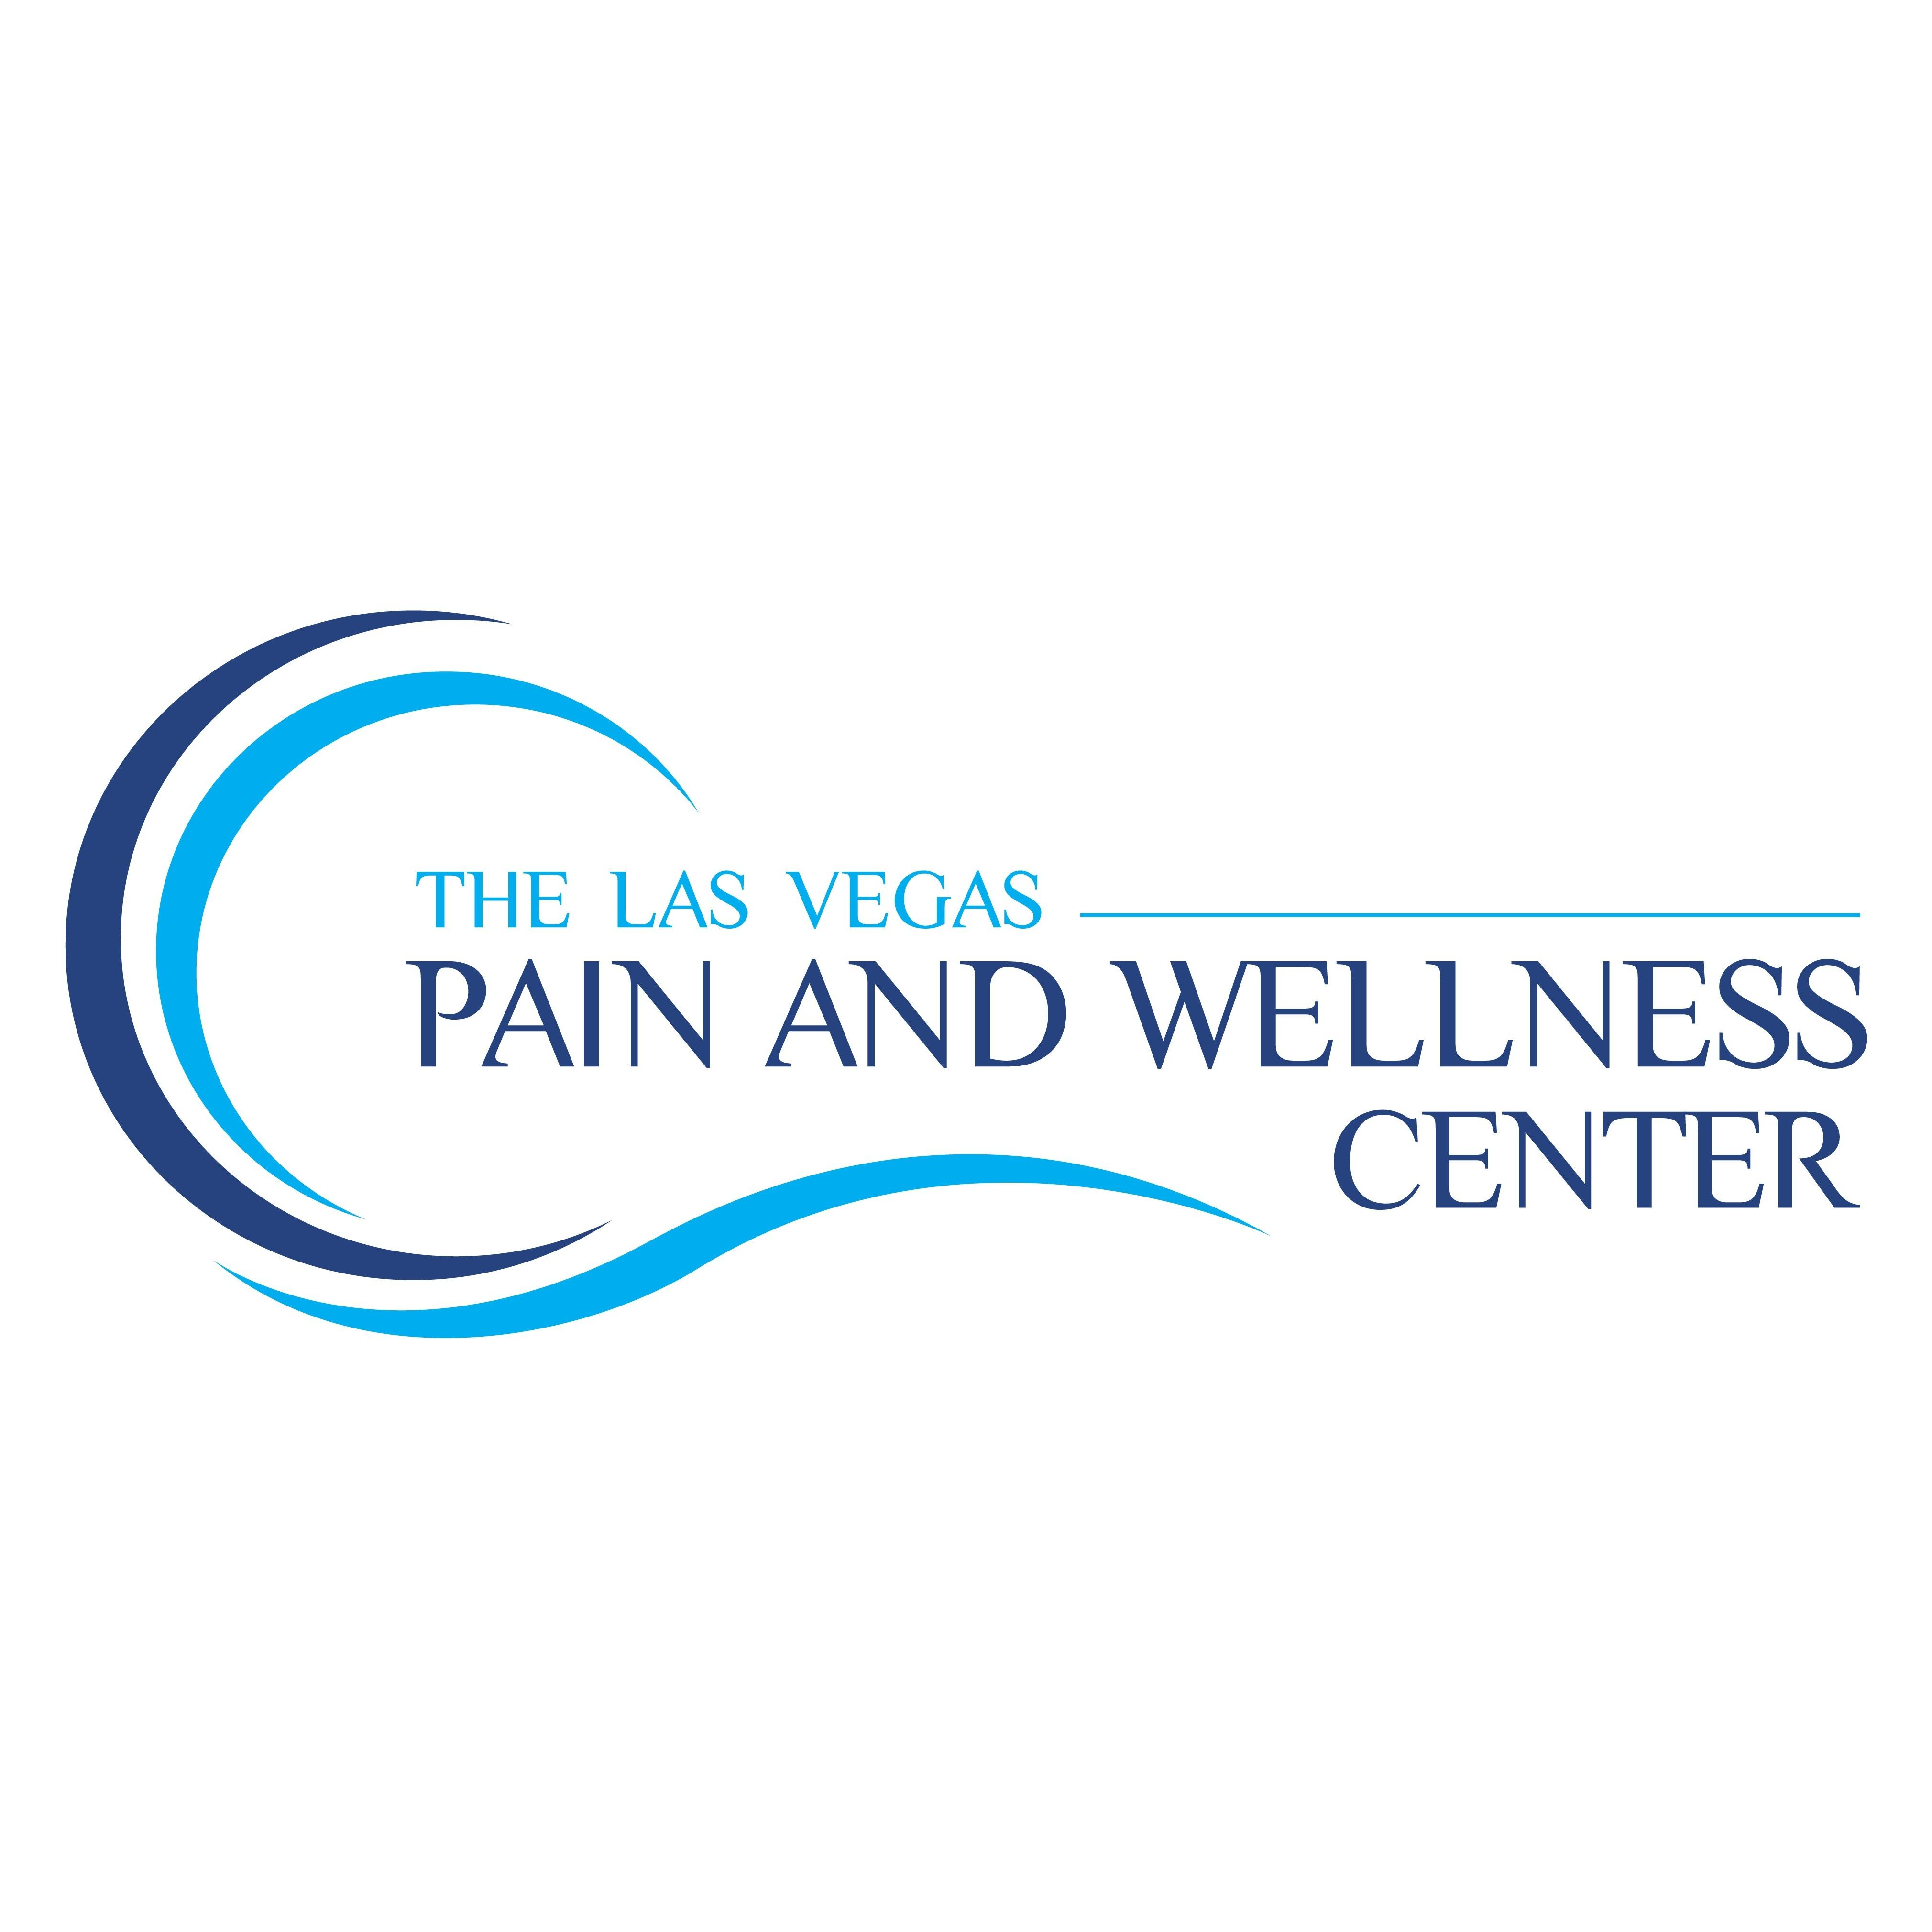 The Las Vegas Pain and Wellness Center